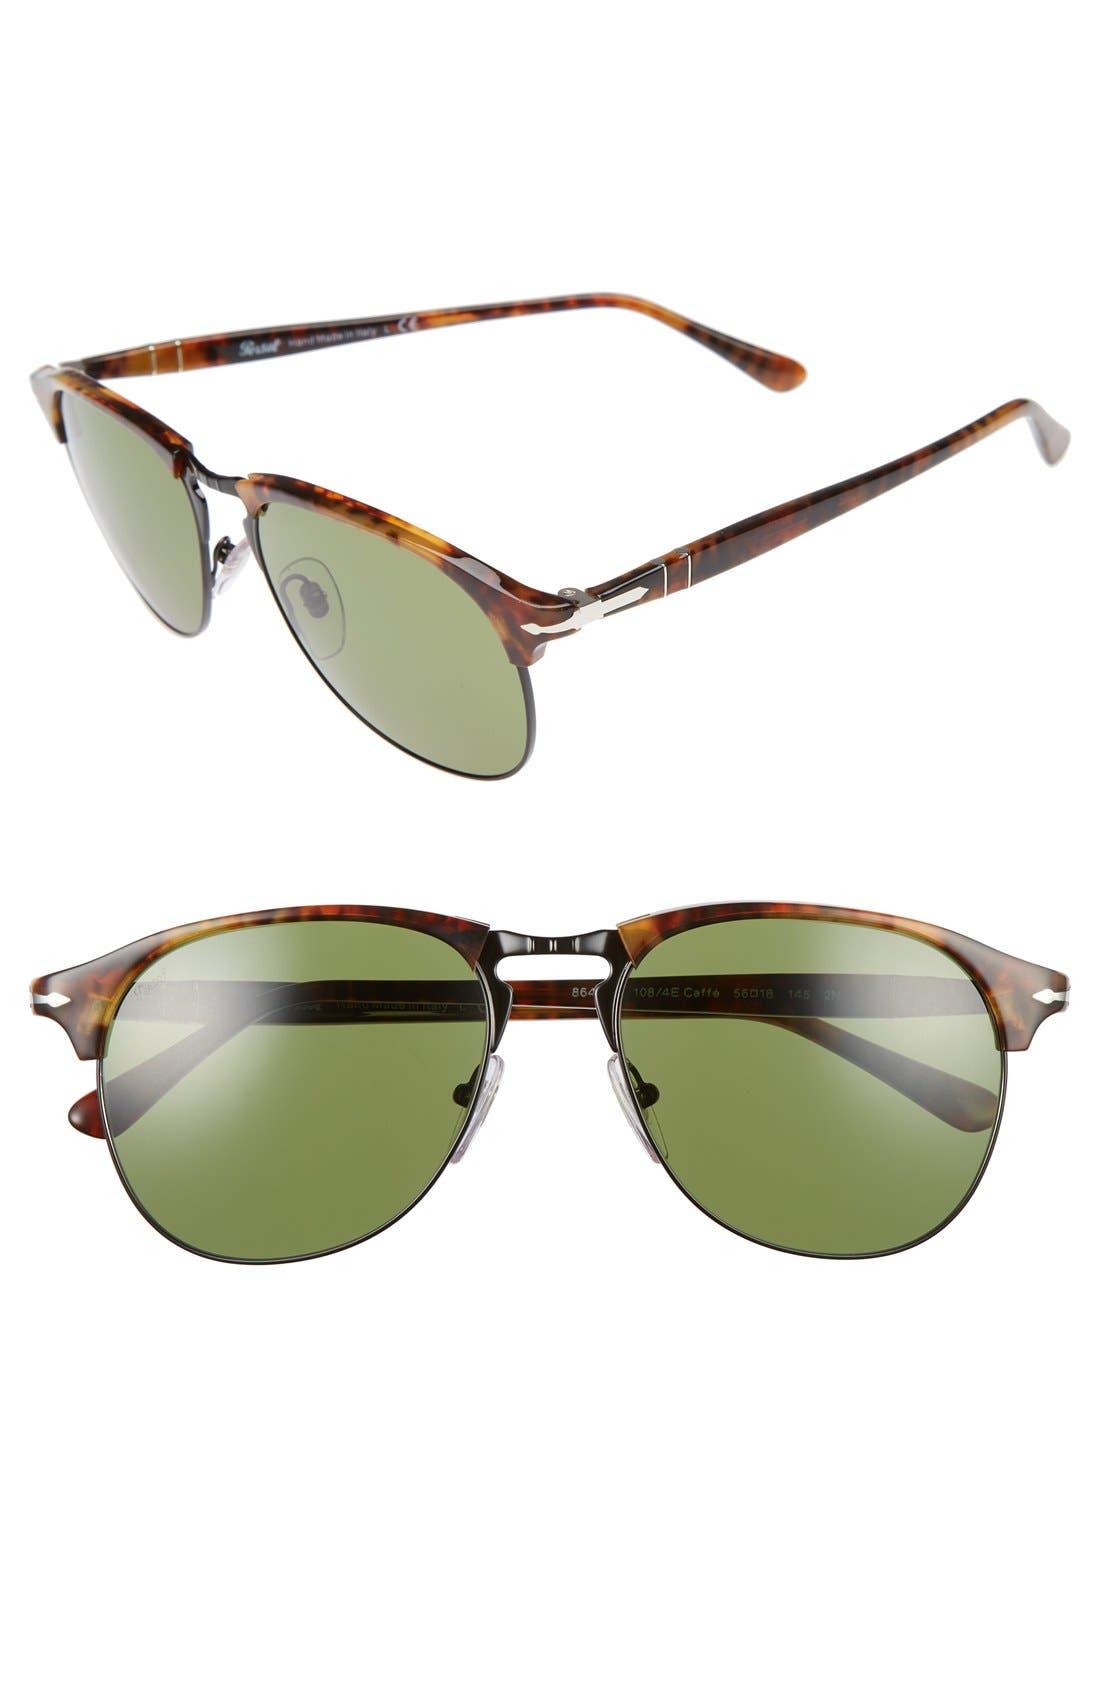 56mm Keyhole Sunglasses,                             Main thumbnail 1, color,                             DARK HAVANA